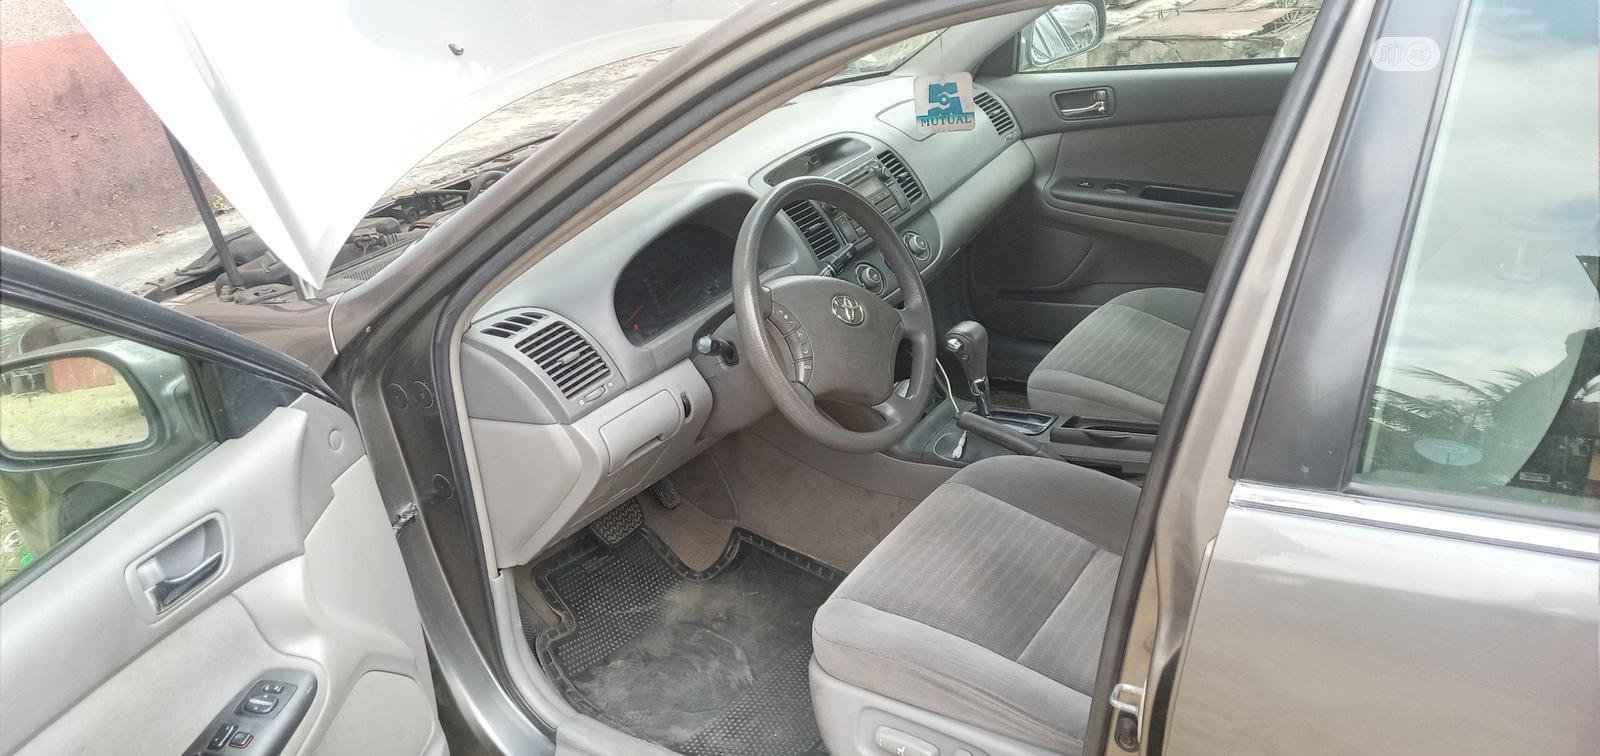 Toyota Camry 2005 Gray | Cars for sale in Amuwo-Odofin, Lagos State, Nigeria